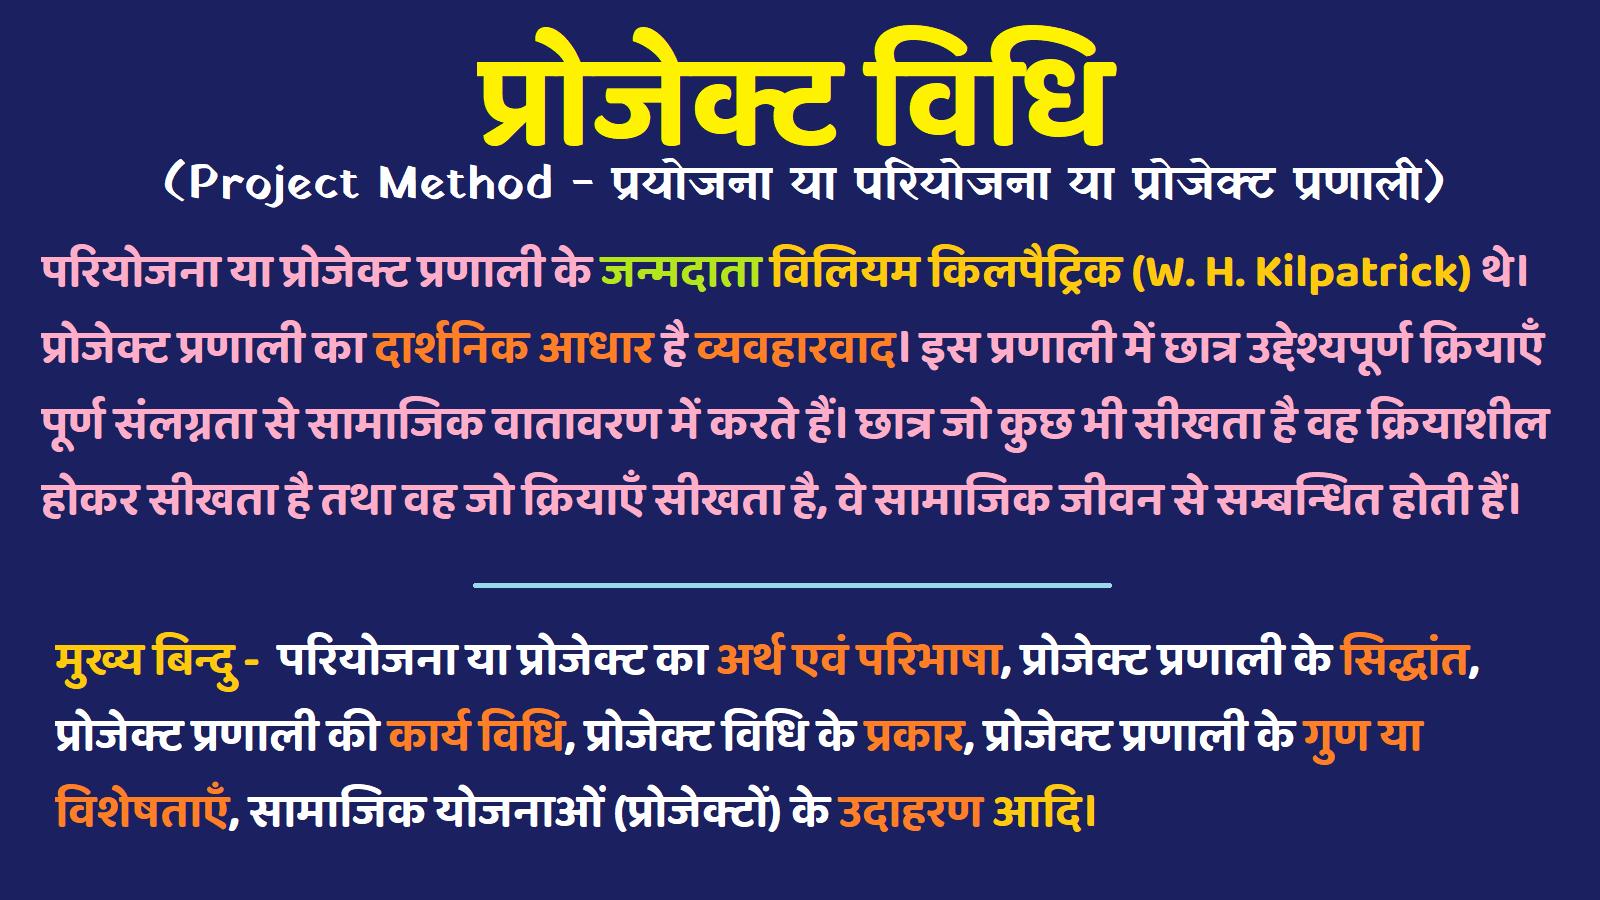 Project Vidhi